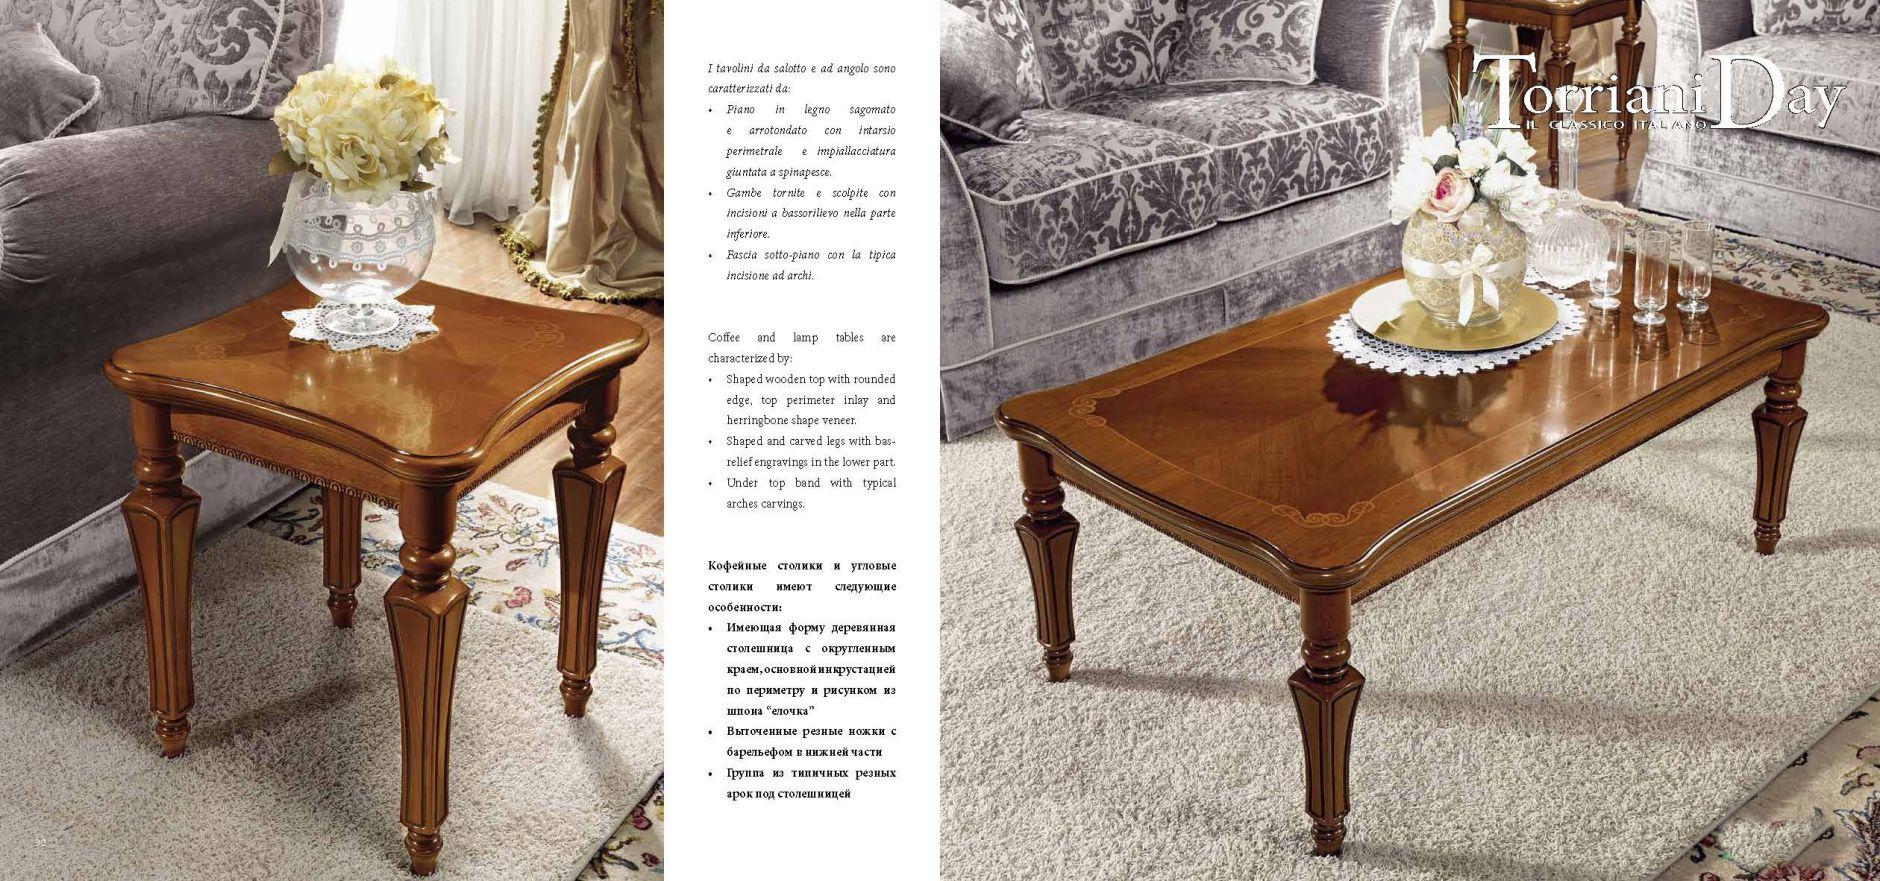 Klassische Mapbel Wohnzimmer Mapbel Camelgroup Serie Tag Torriani .